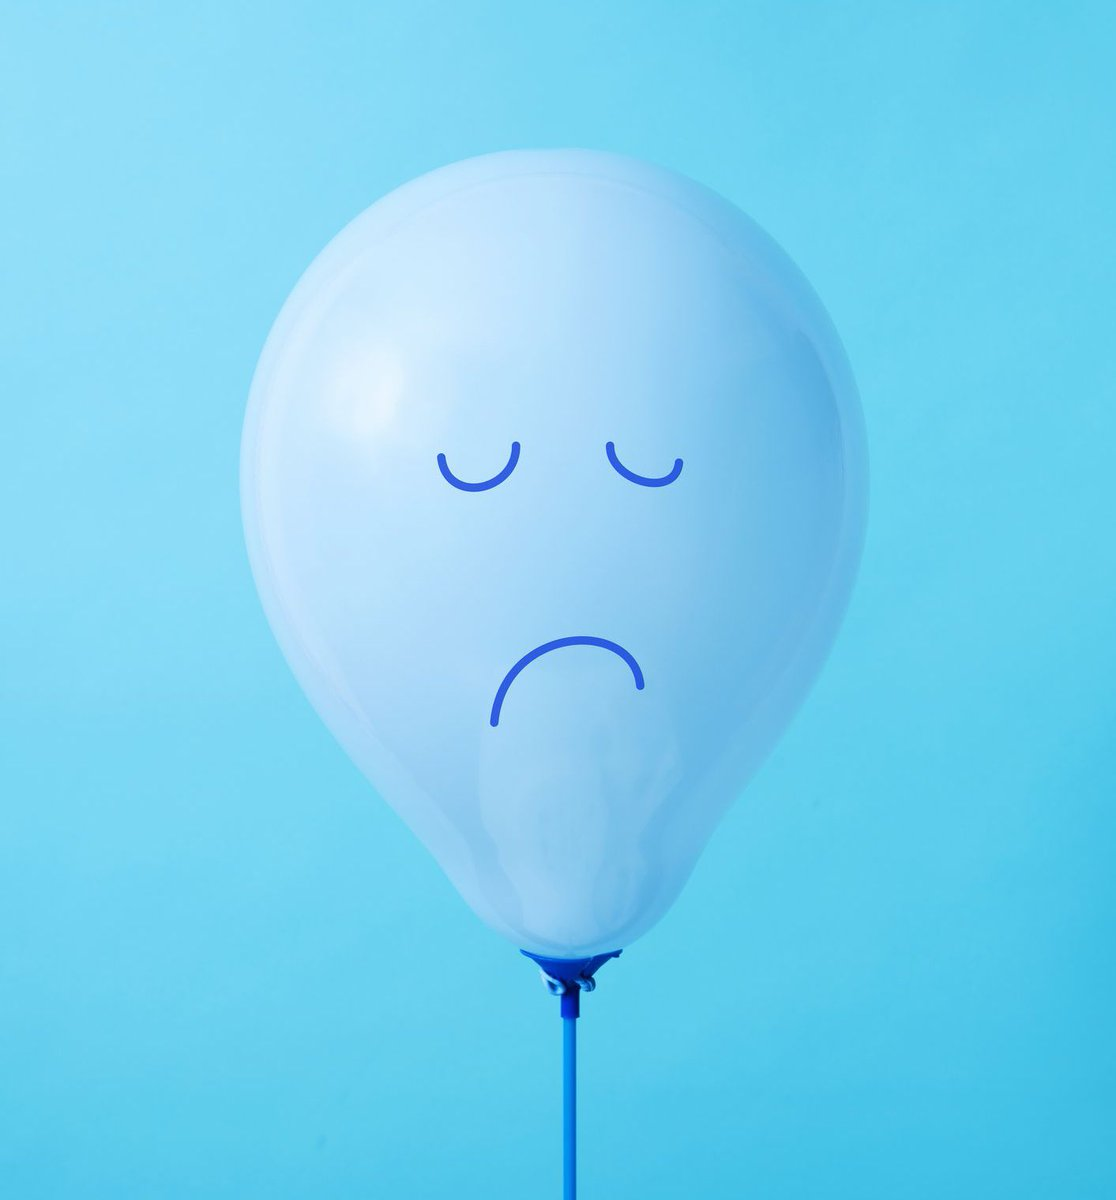 We hope you've survived Blue Monday 2021, supposably the most depressing day of the year.   #bluemonday #bluemonday2021 #mondaymood #mondaymotivation